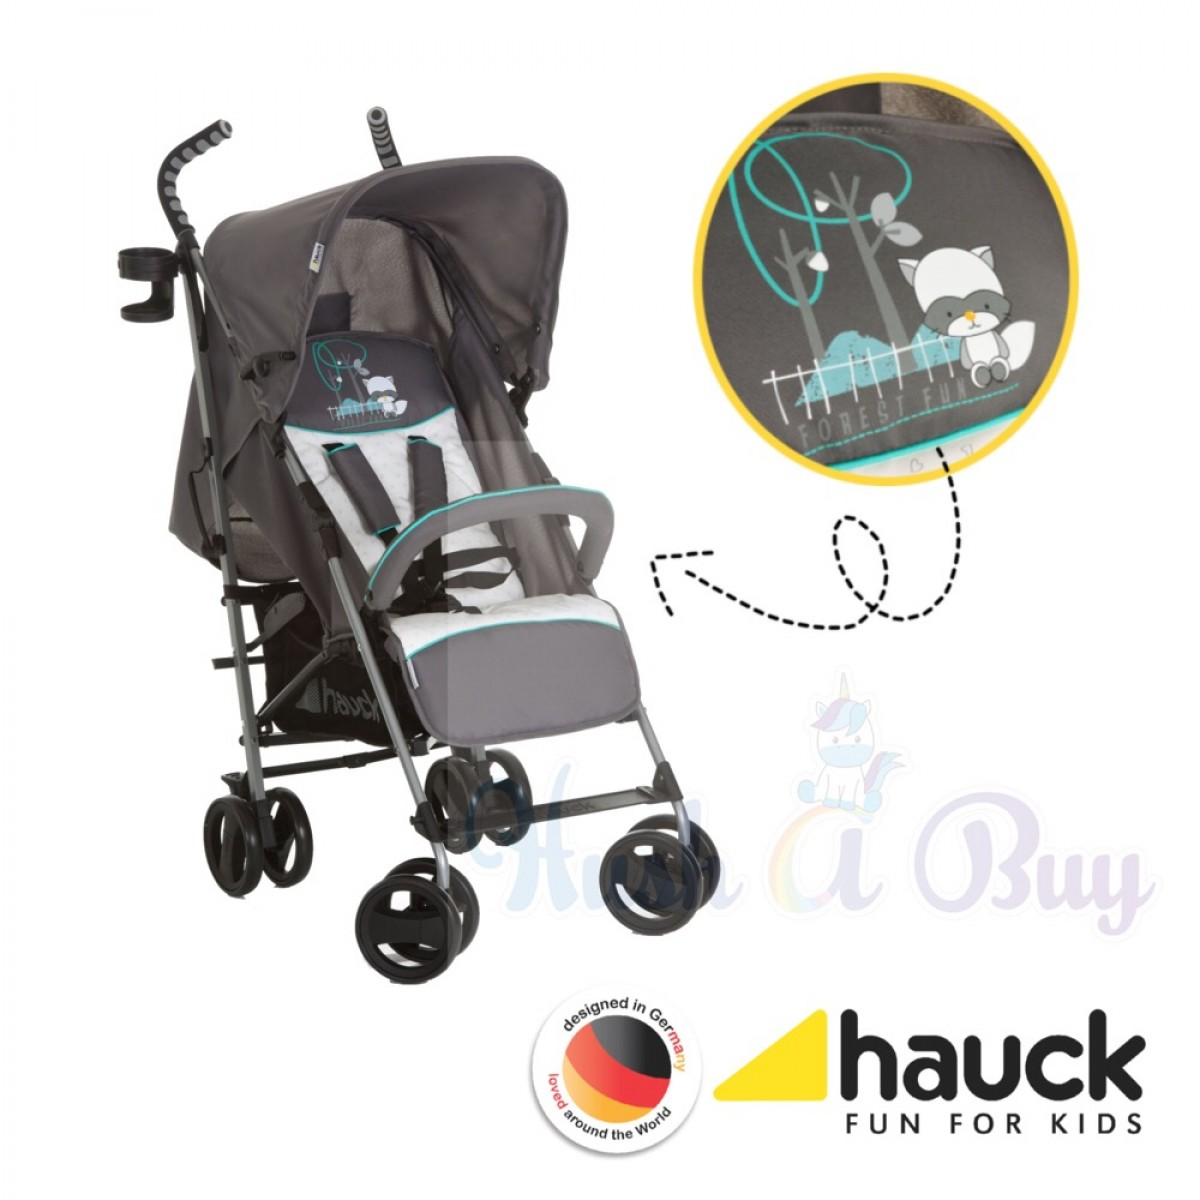 Hauck Speed Plus S Stroller- Neon Yellow / Forest Fun